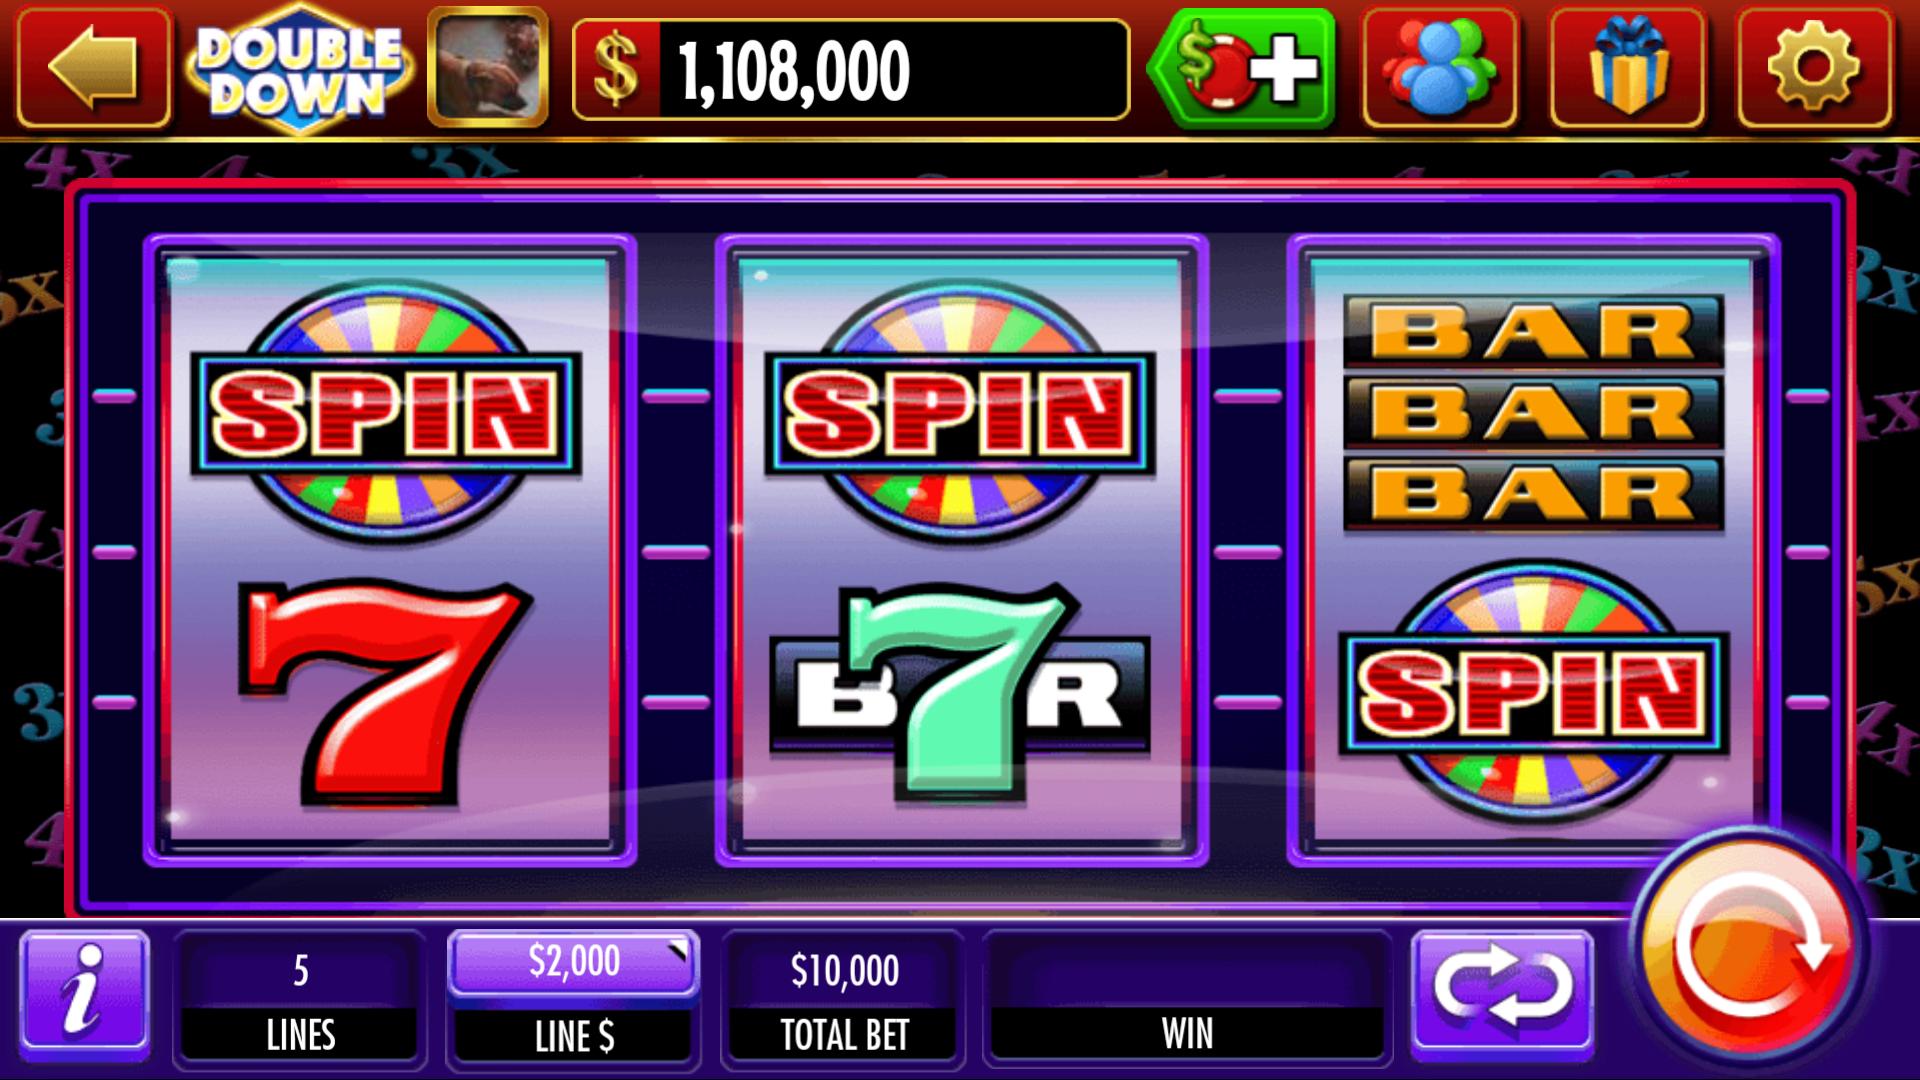 DoubleDown Casino Game Interface